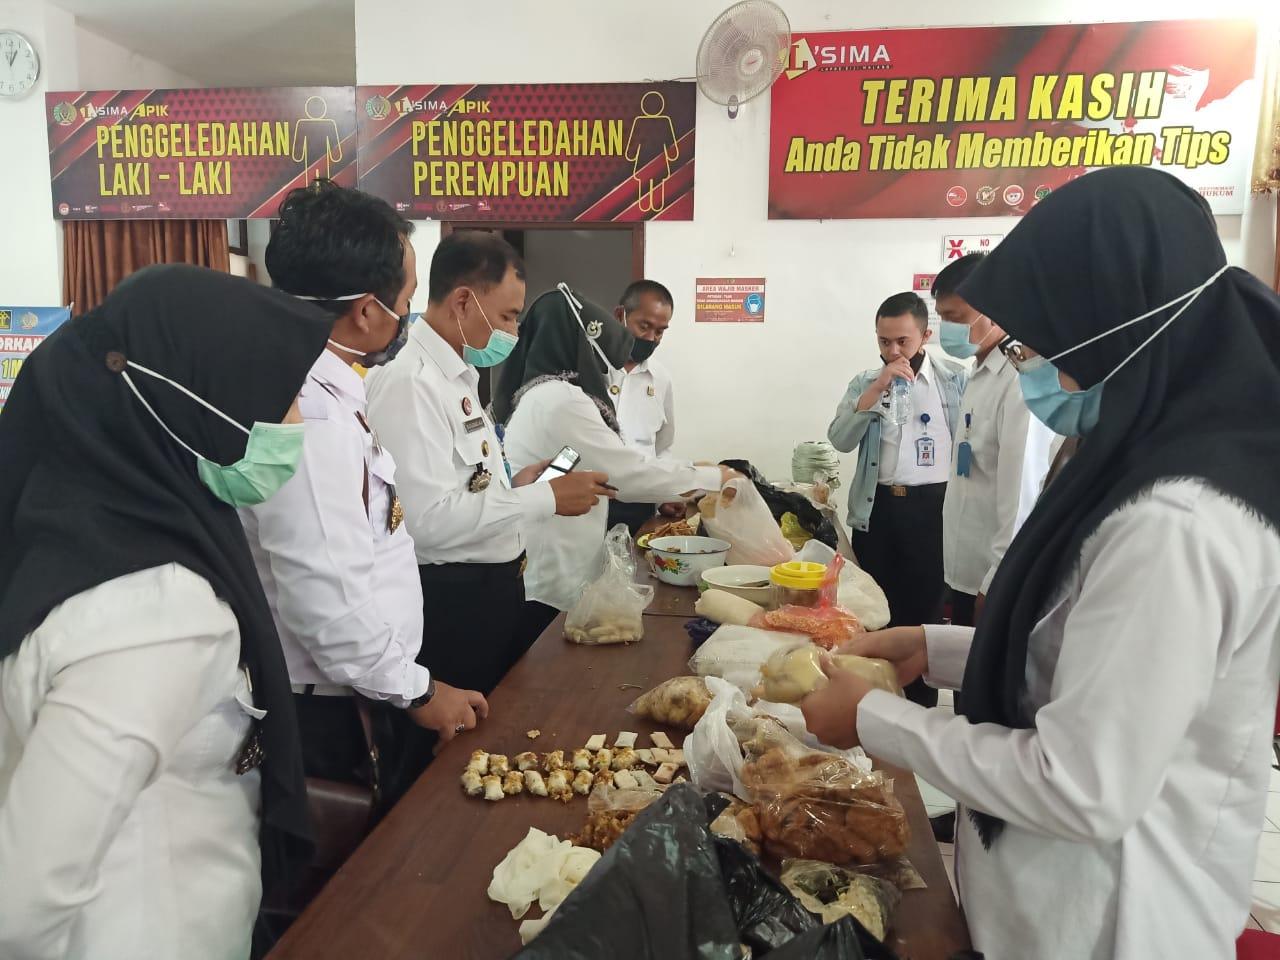 Sebanyak 50 poket kecil isi tembakau diduga narkoba ditemukan di dalam kepalan mendol, makanan khas Malang. Makanan ini akan dikirim ke warga binaan di Lapas Klas I Lowokwaru, Malang. (Foto: Humas Lapas Lowokwaru/Tugu Jatim)